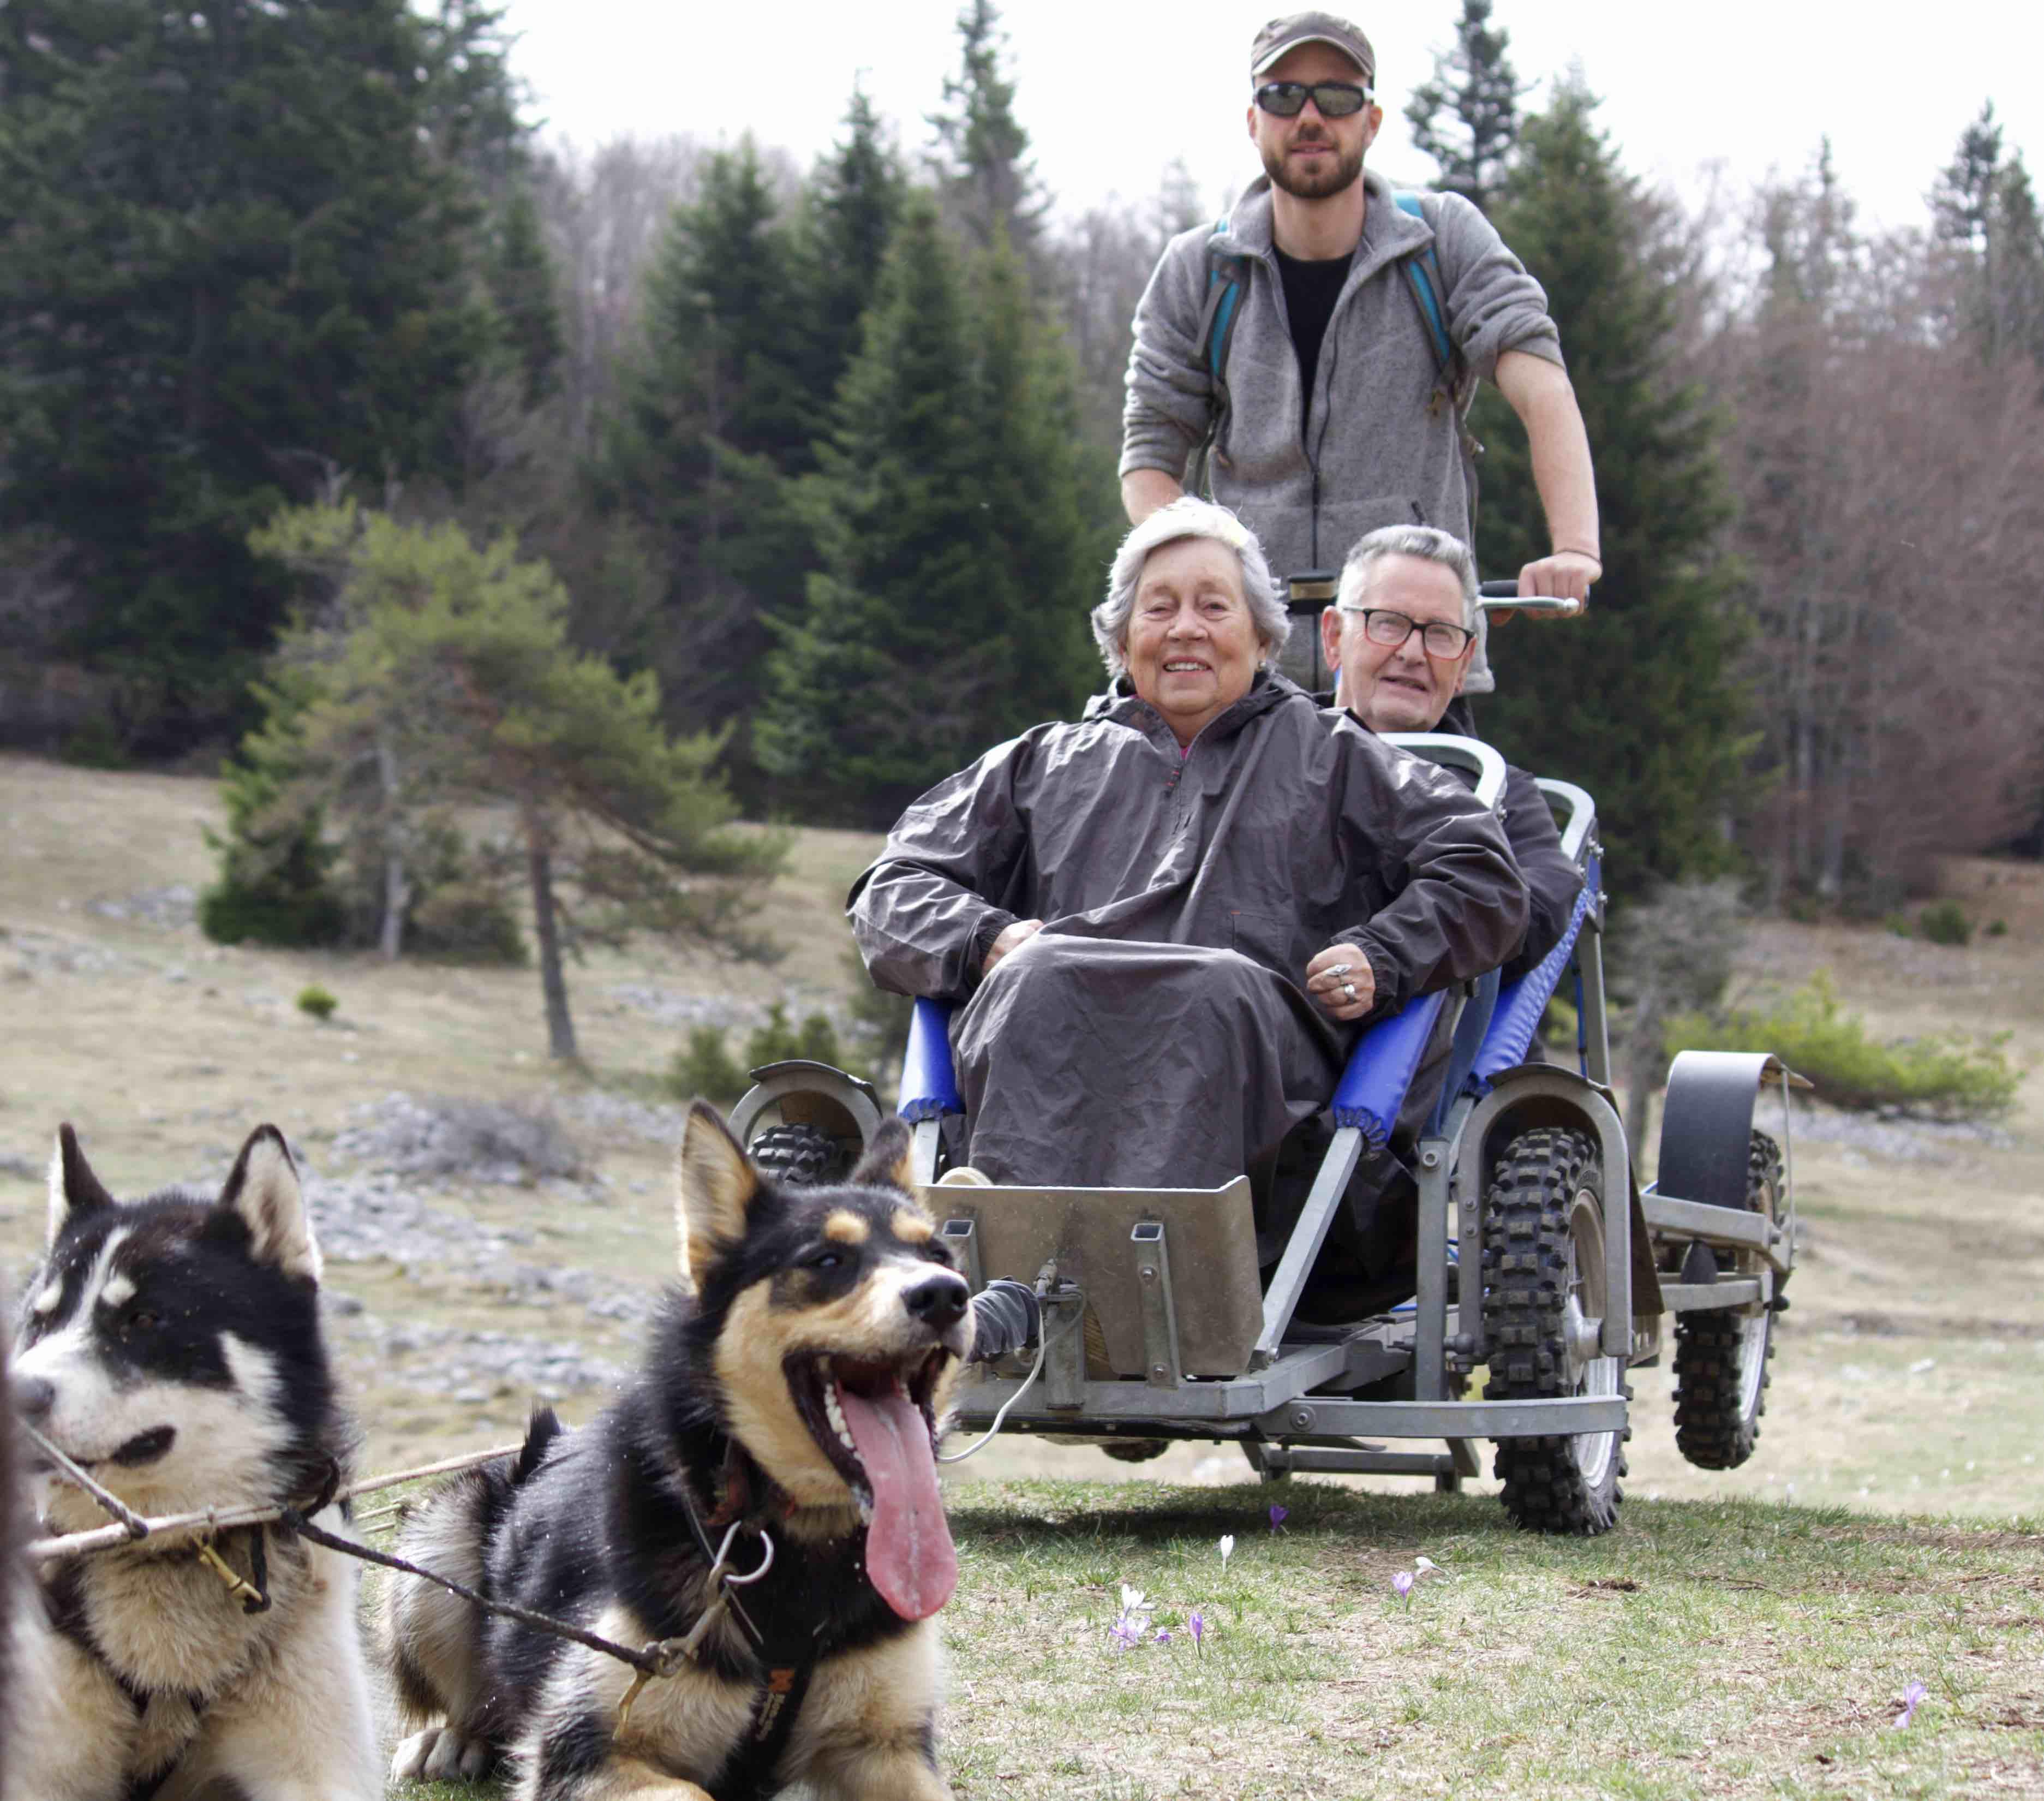 Balade chien de traineau cani-kart